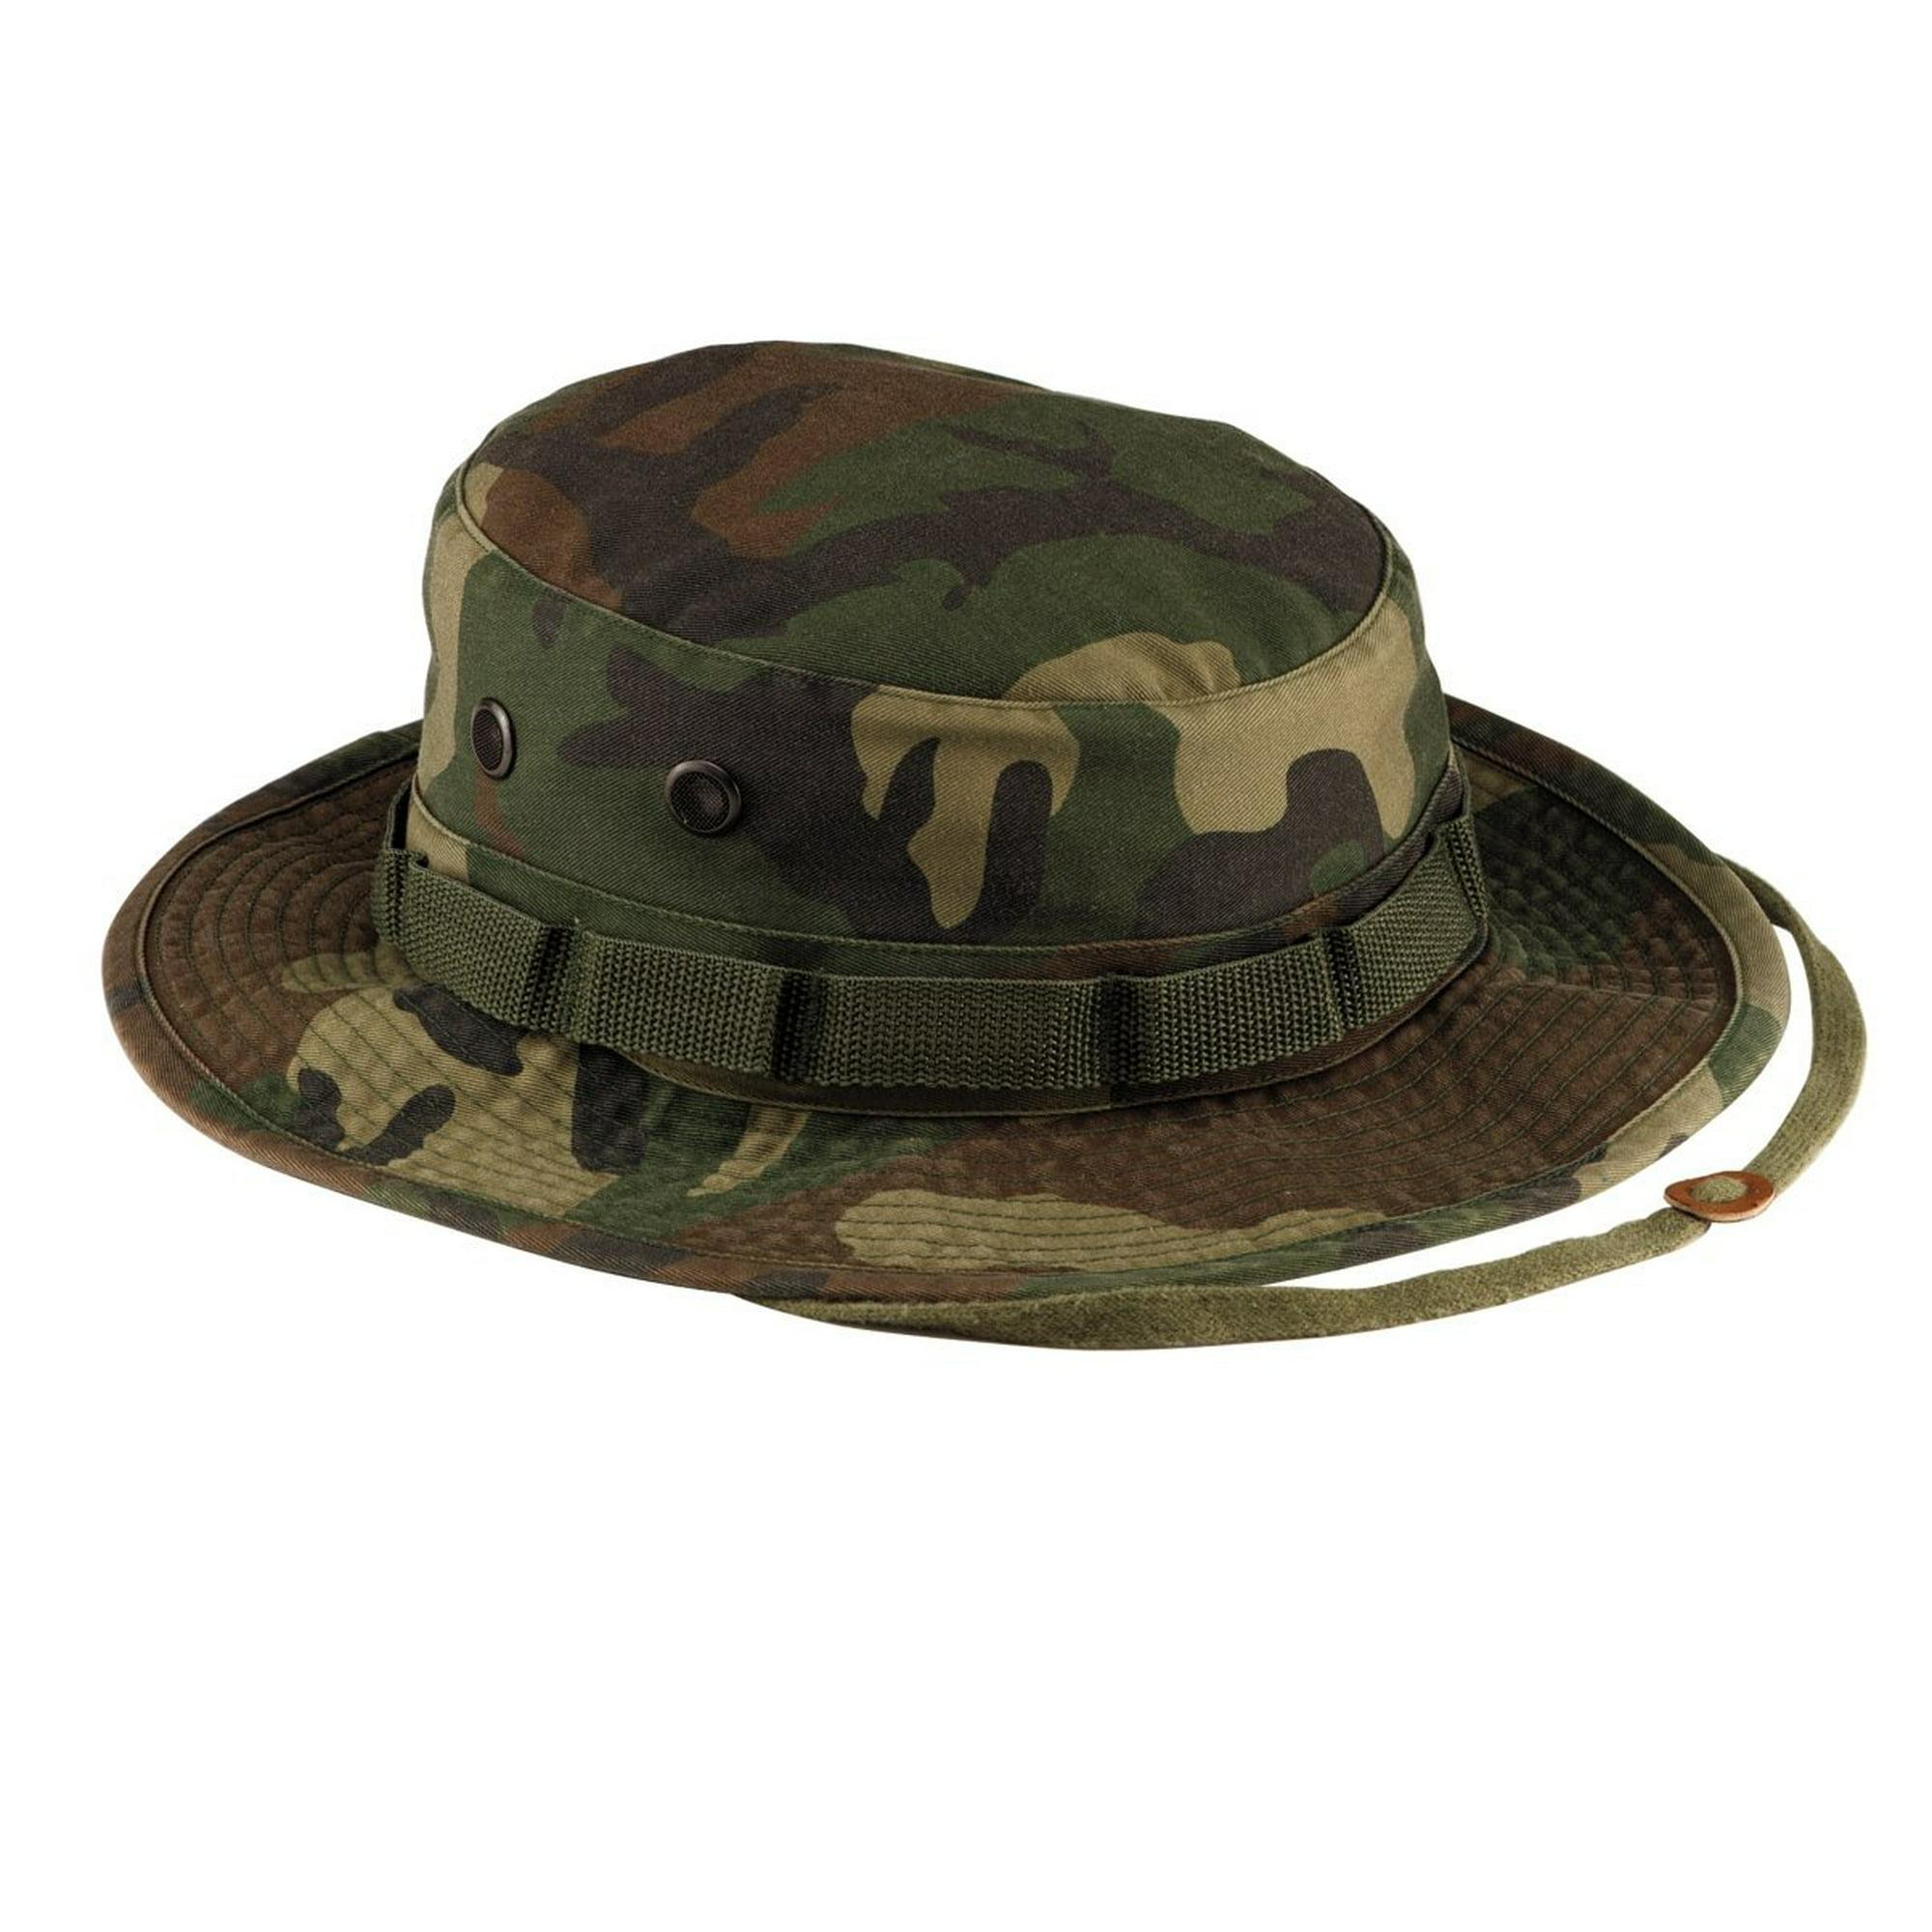 5591bb9599210 Rothco Vintage Boonie Hat - Woodland Camo